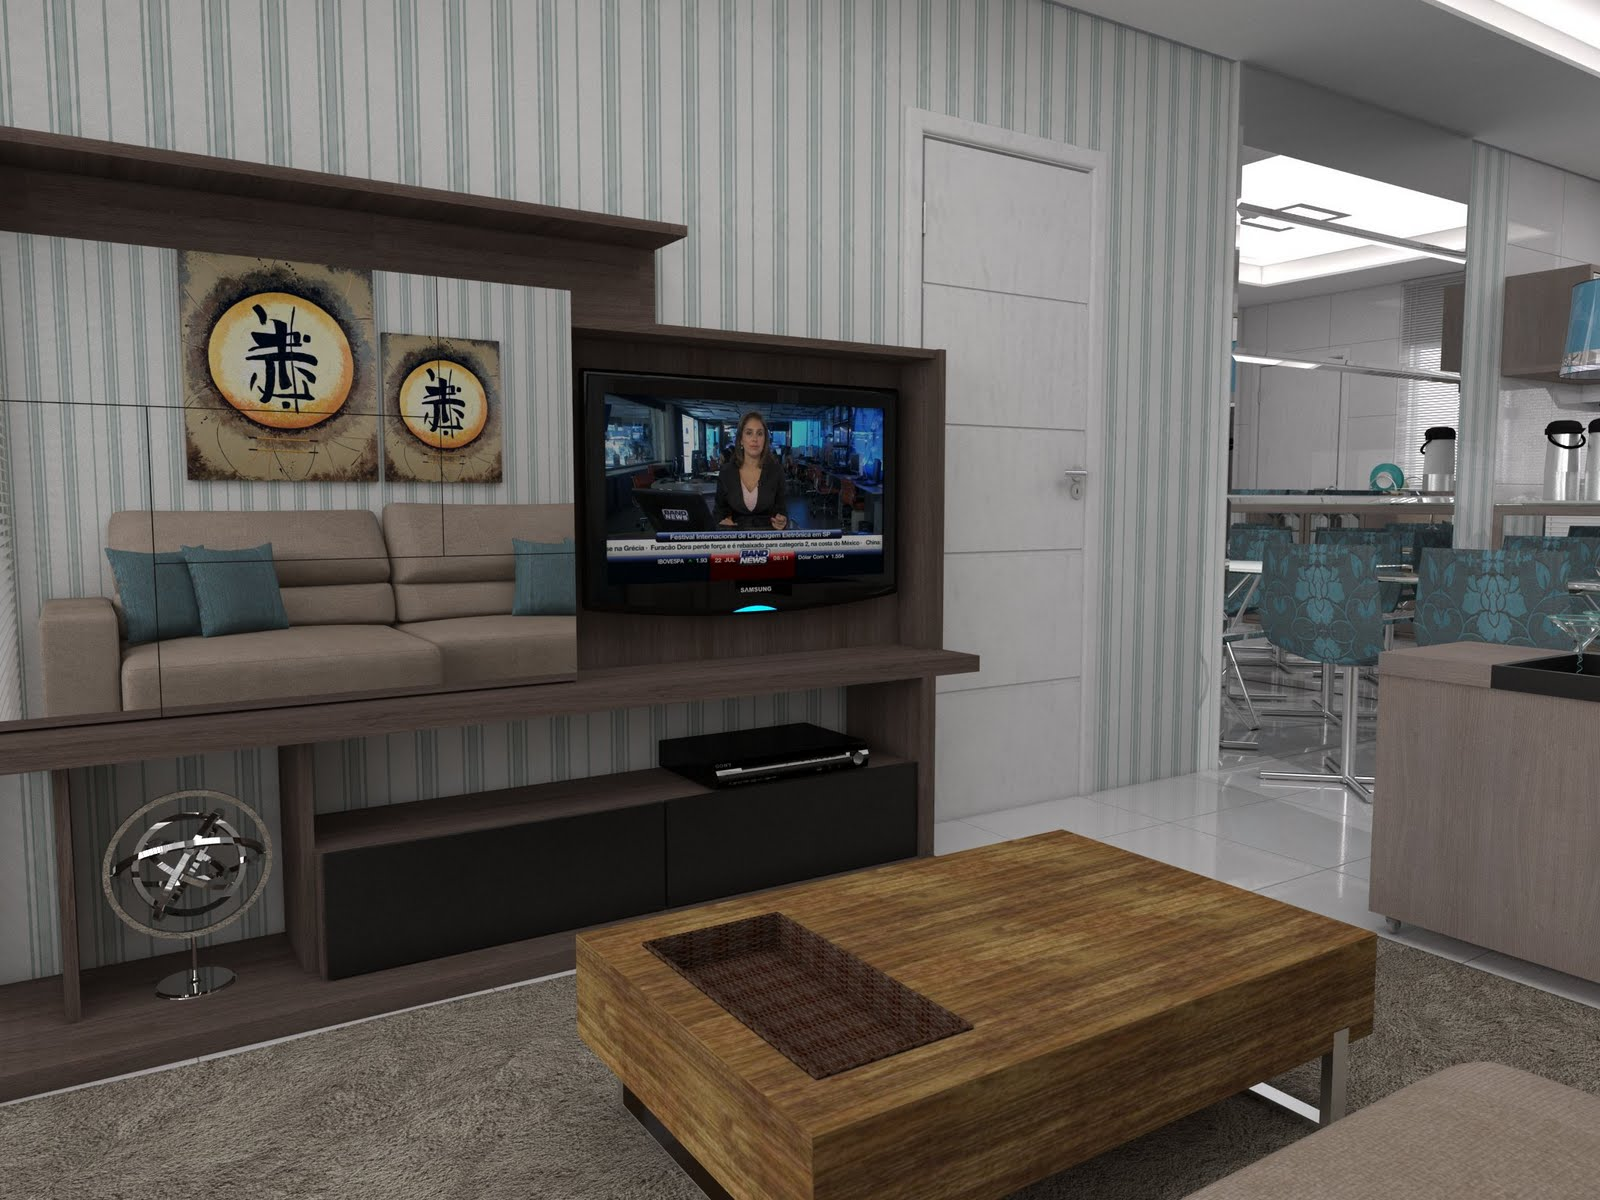 Pin Cozinha E Sala De Jantar Conjugada Minha Casa Cara Hd On Pinterest #644D37 1600x1200